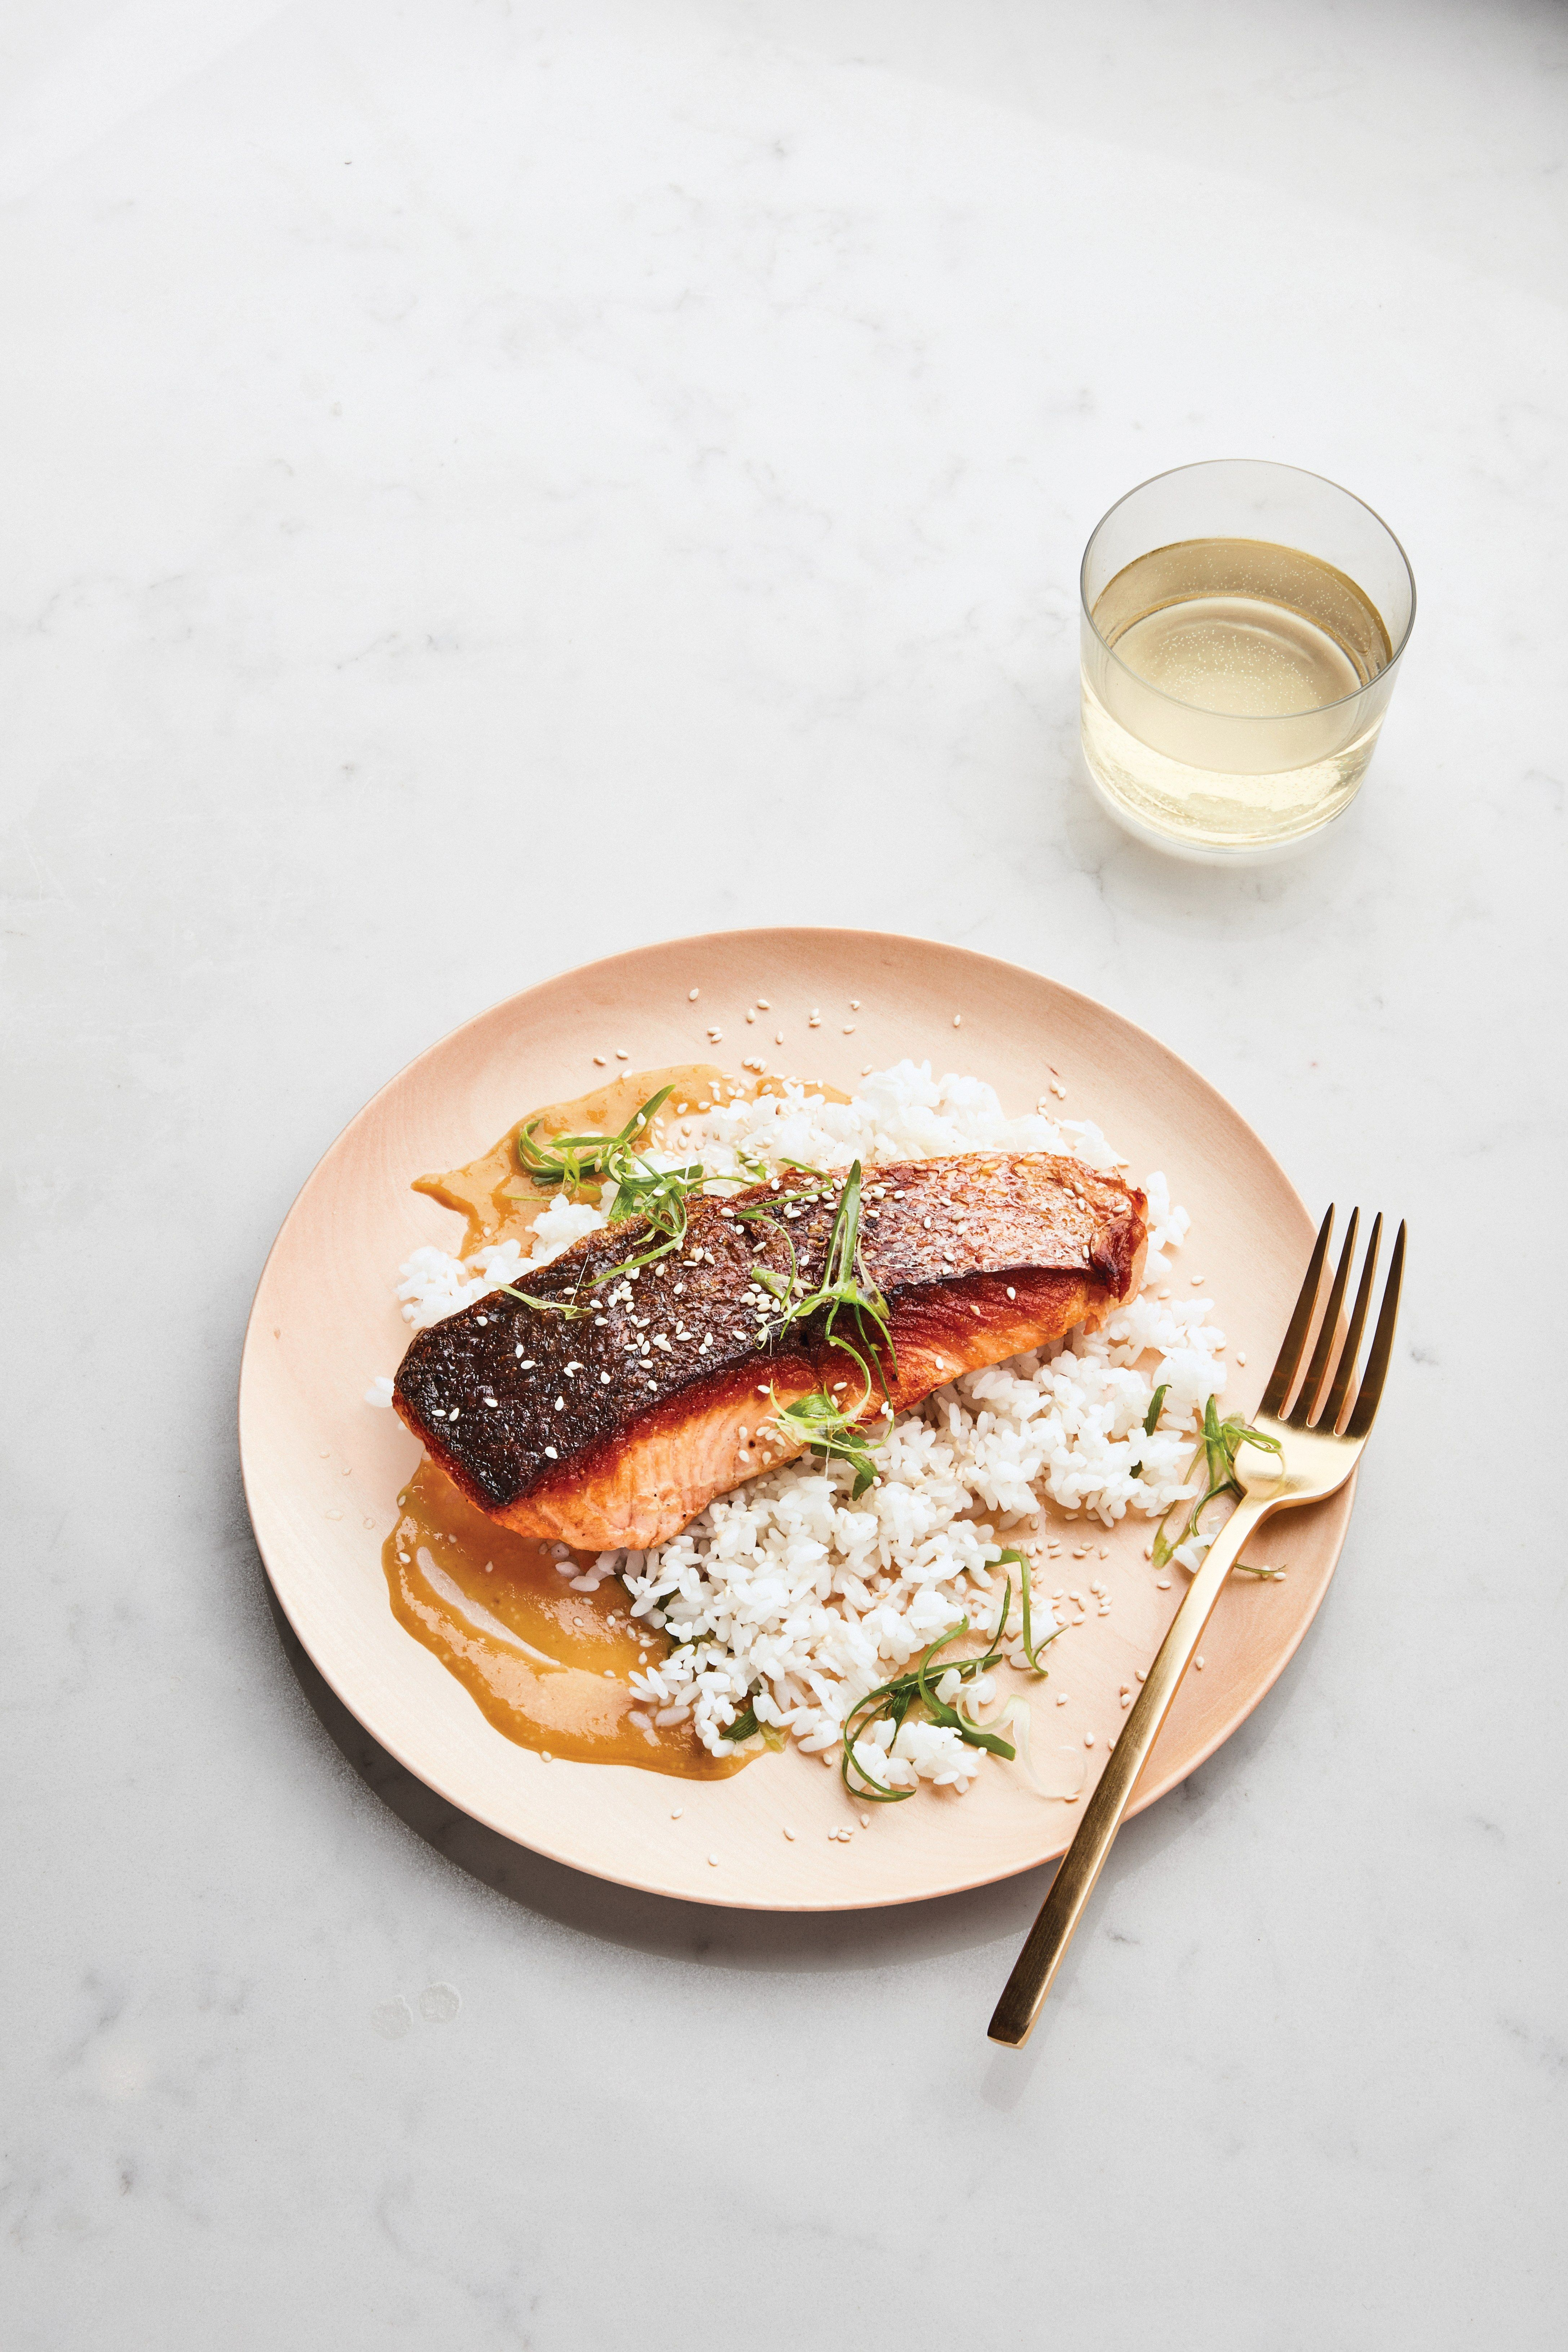 Seared Crispy Skin Salmon With Miso Honey Sauce Recipe Epicurious Recipe Cooking Salmon Salmon Recipes Honey Sauce